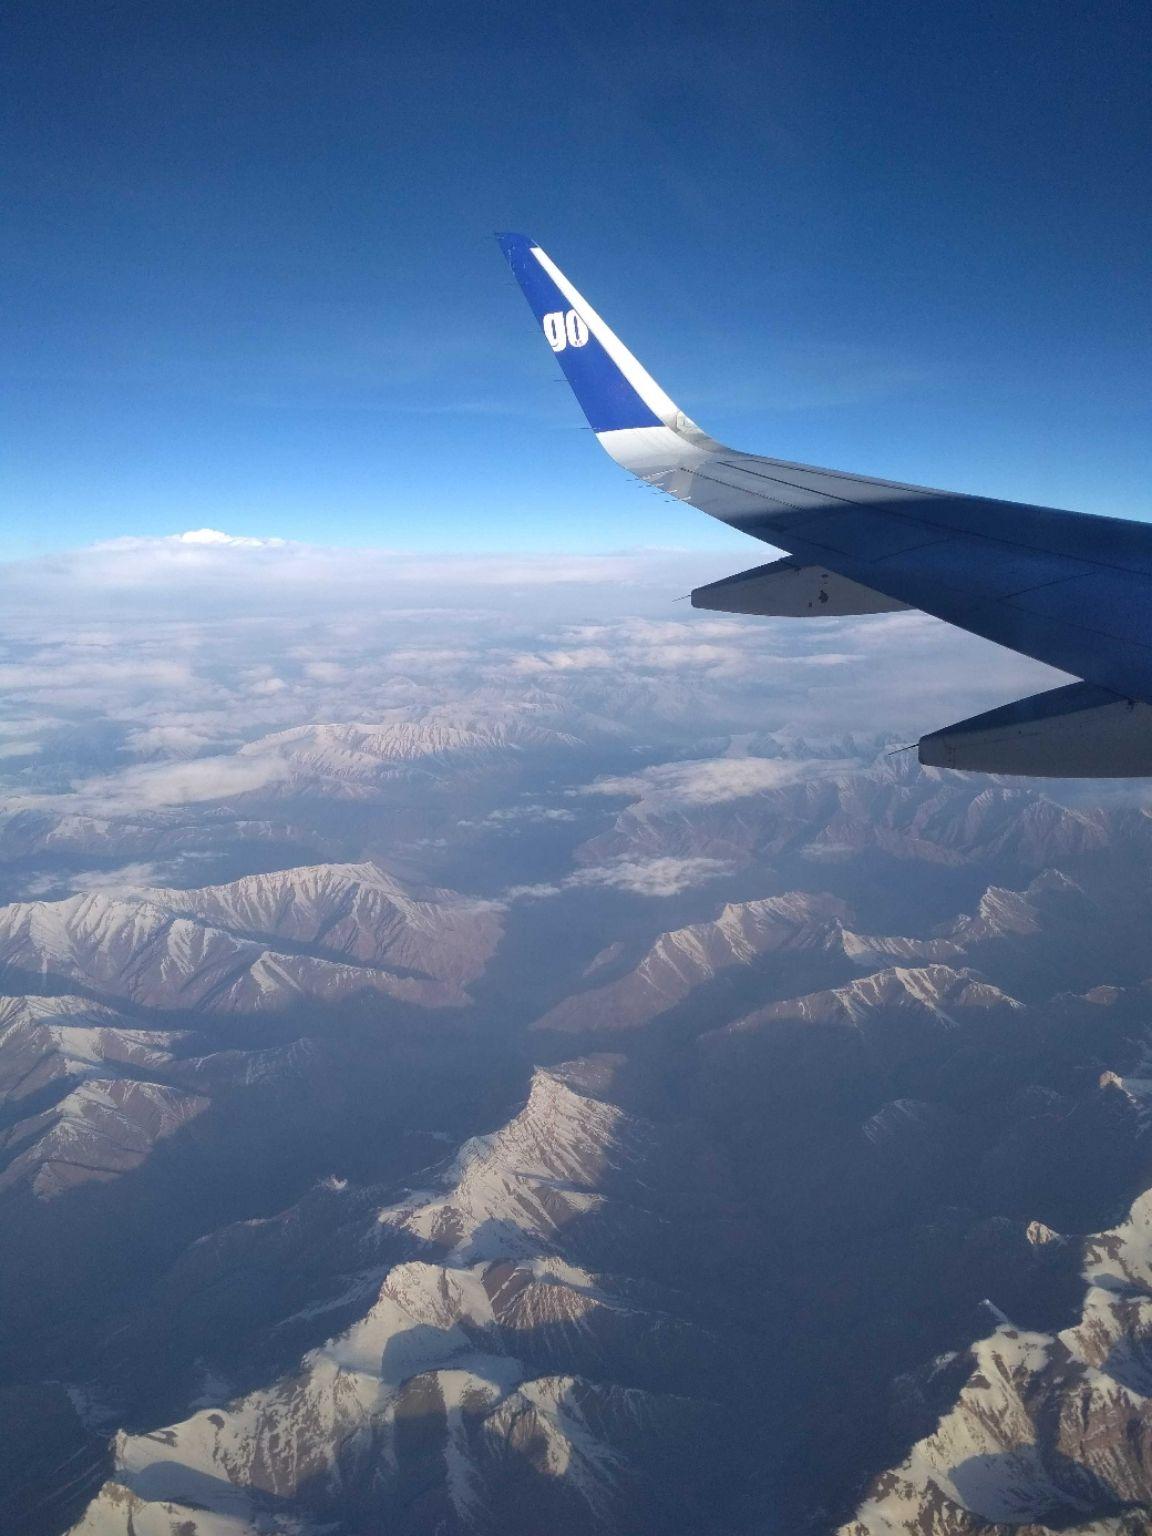 Photo of Ladakh By Amit Sharma